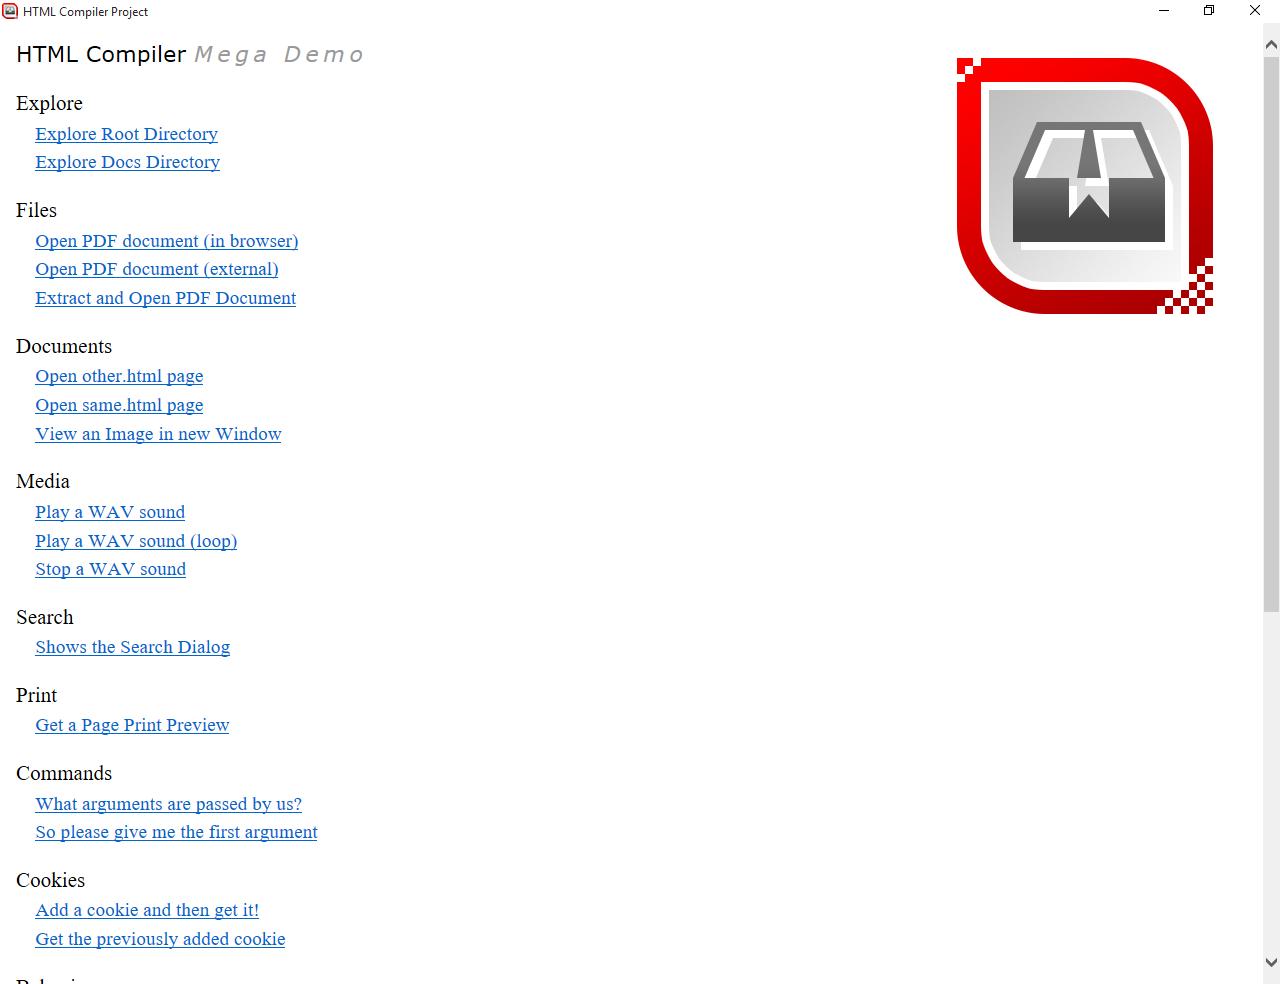 HTML Compiler, Development Tools Software Screenshot